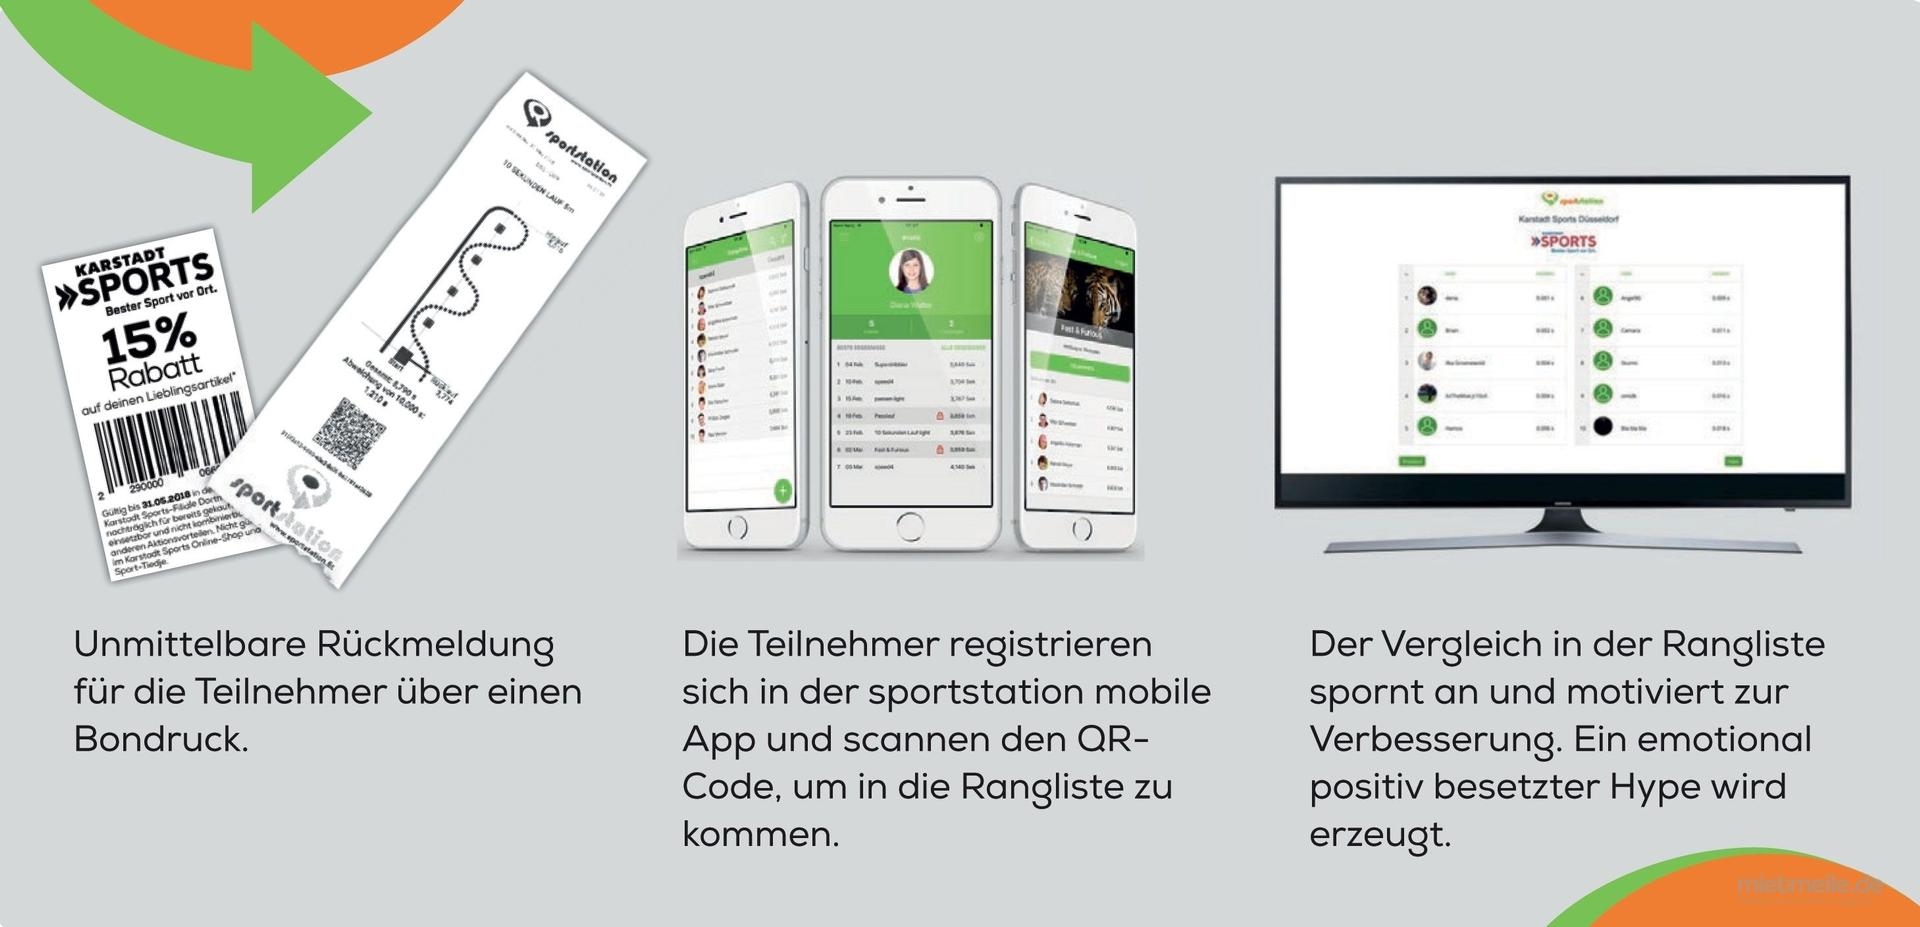 Fußball mieten & vermieten - Sportstation Superdribbler in Bremen